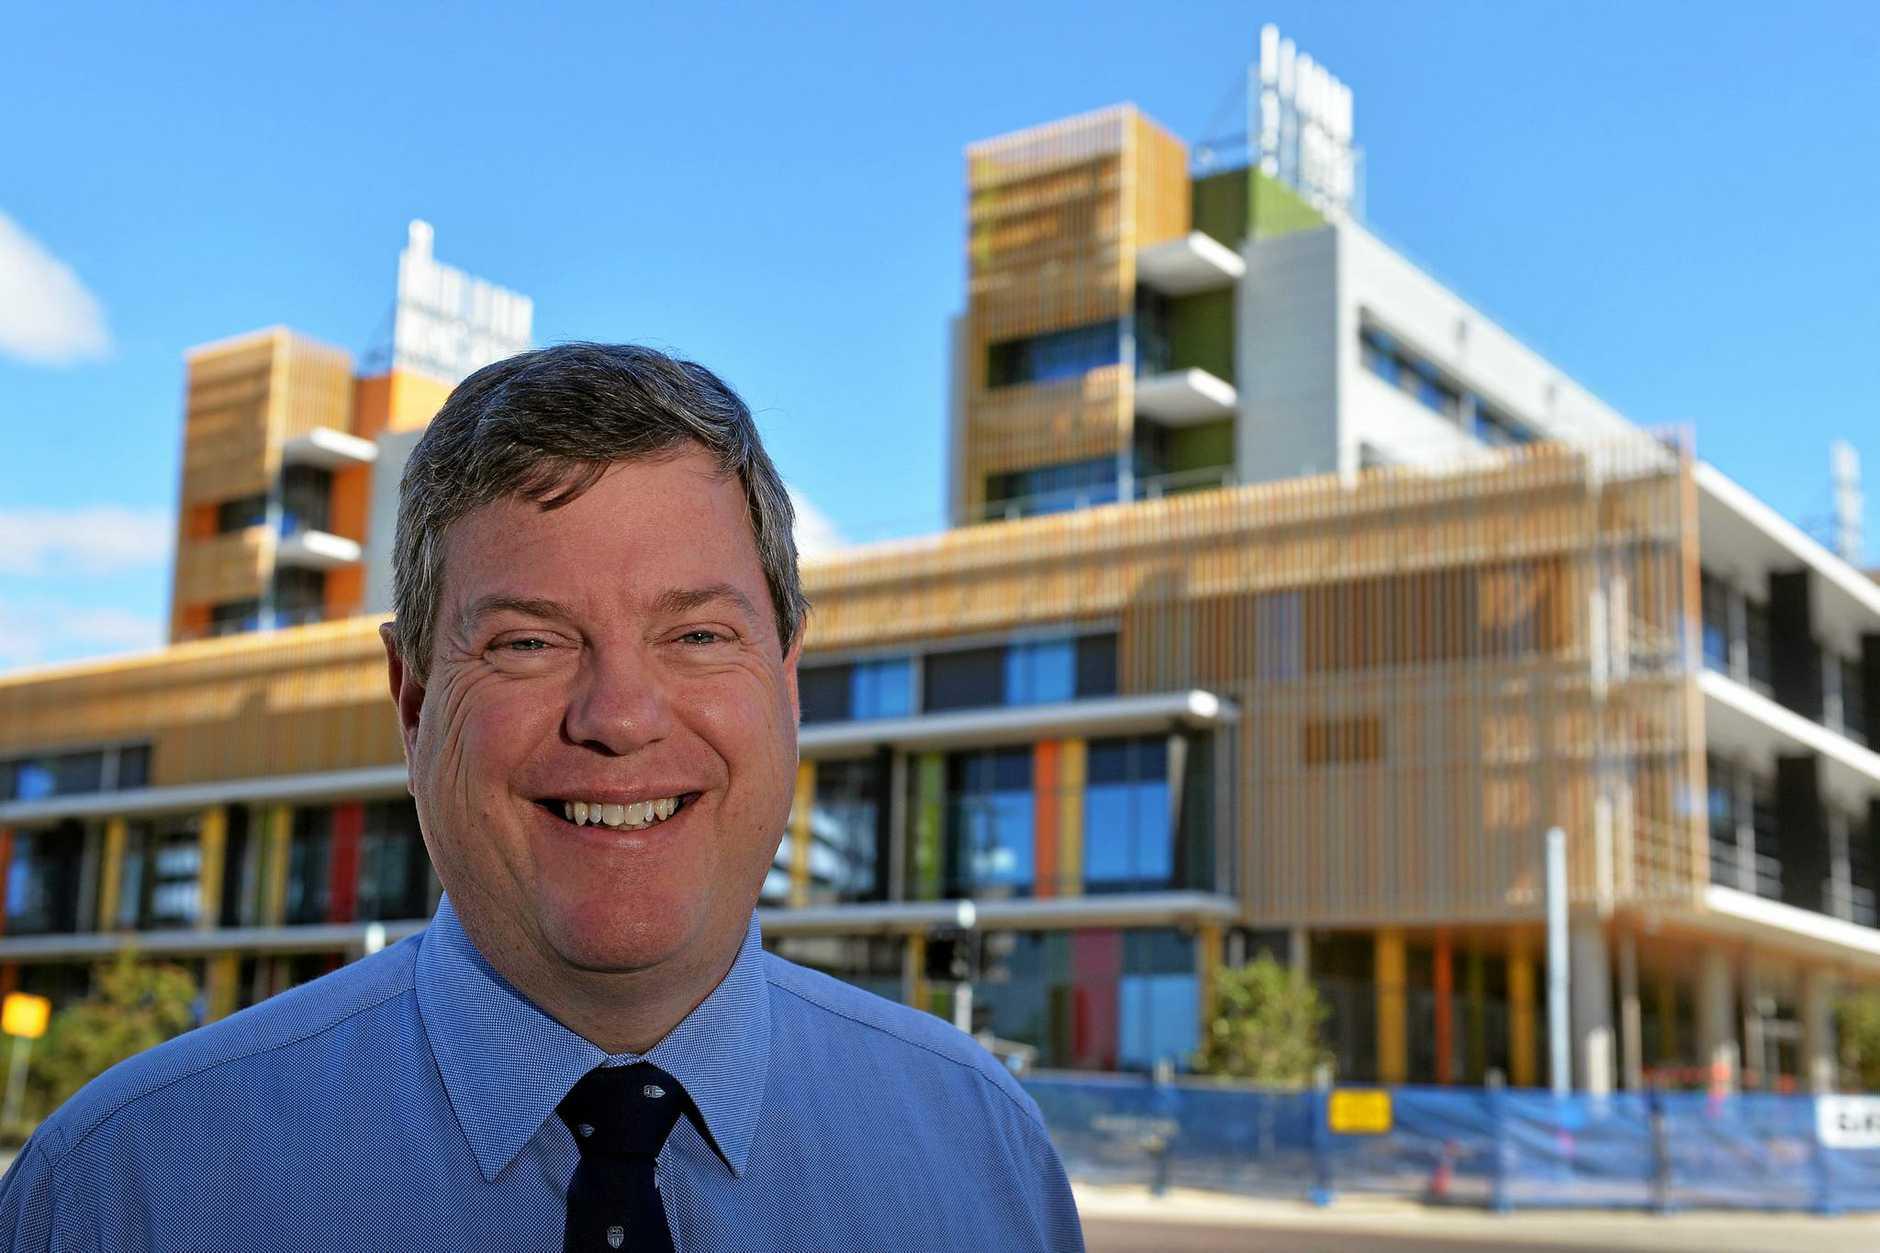 LNP team presser at the Sunshine Coast University Hospital, Birtinya. (centred) Opposition Leader Tim Nicholls.